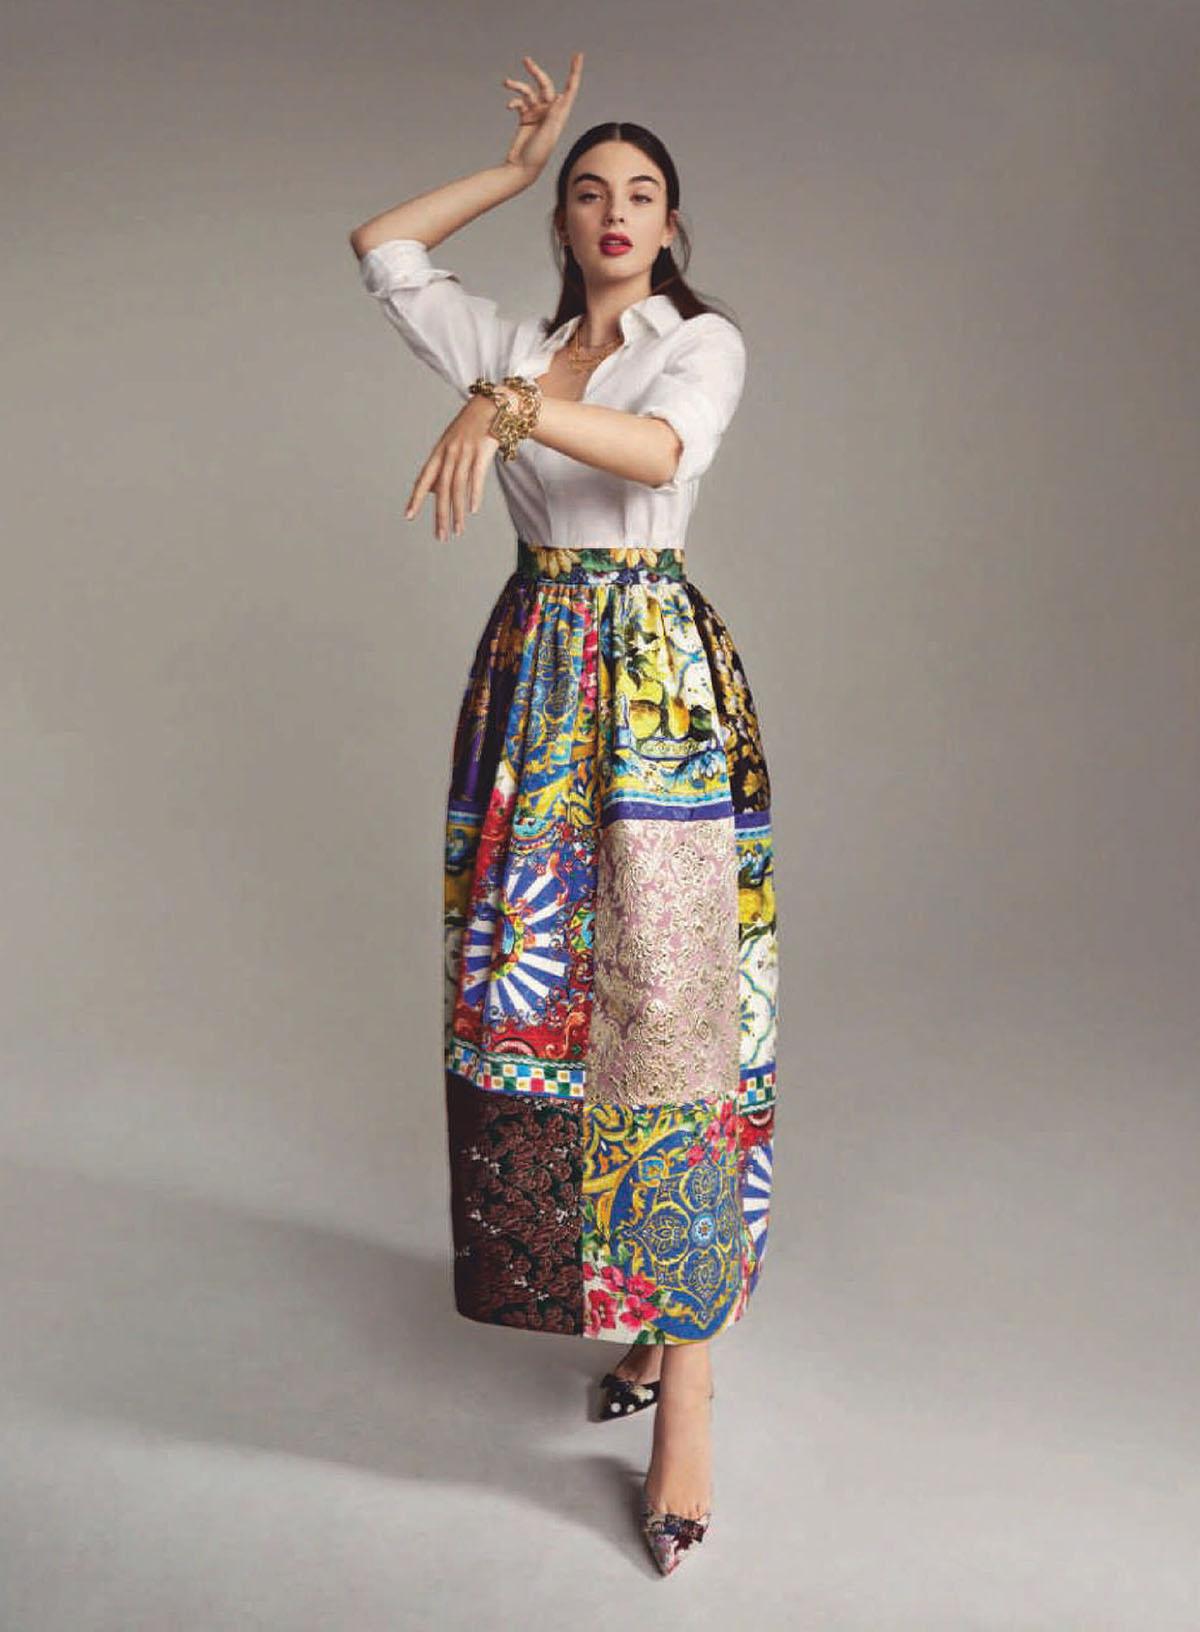 Deva Cassel covers Harper's Bazaar Spain March 2021 by Xavi Gordo